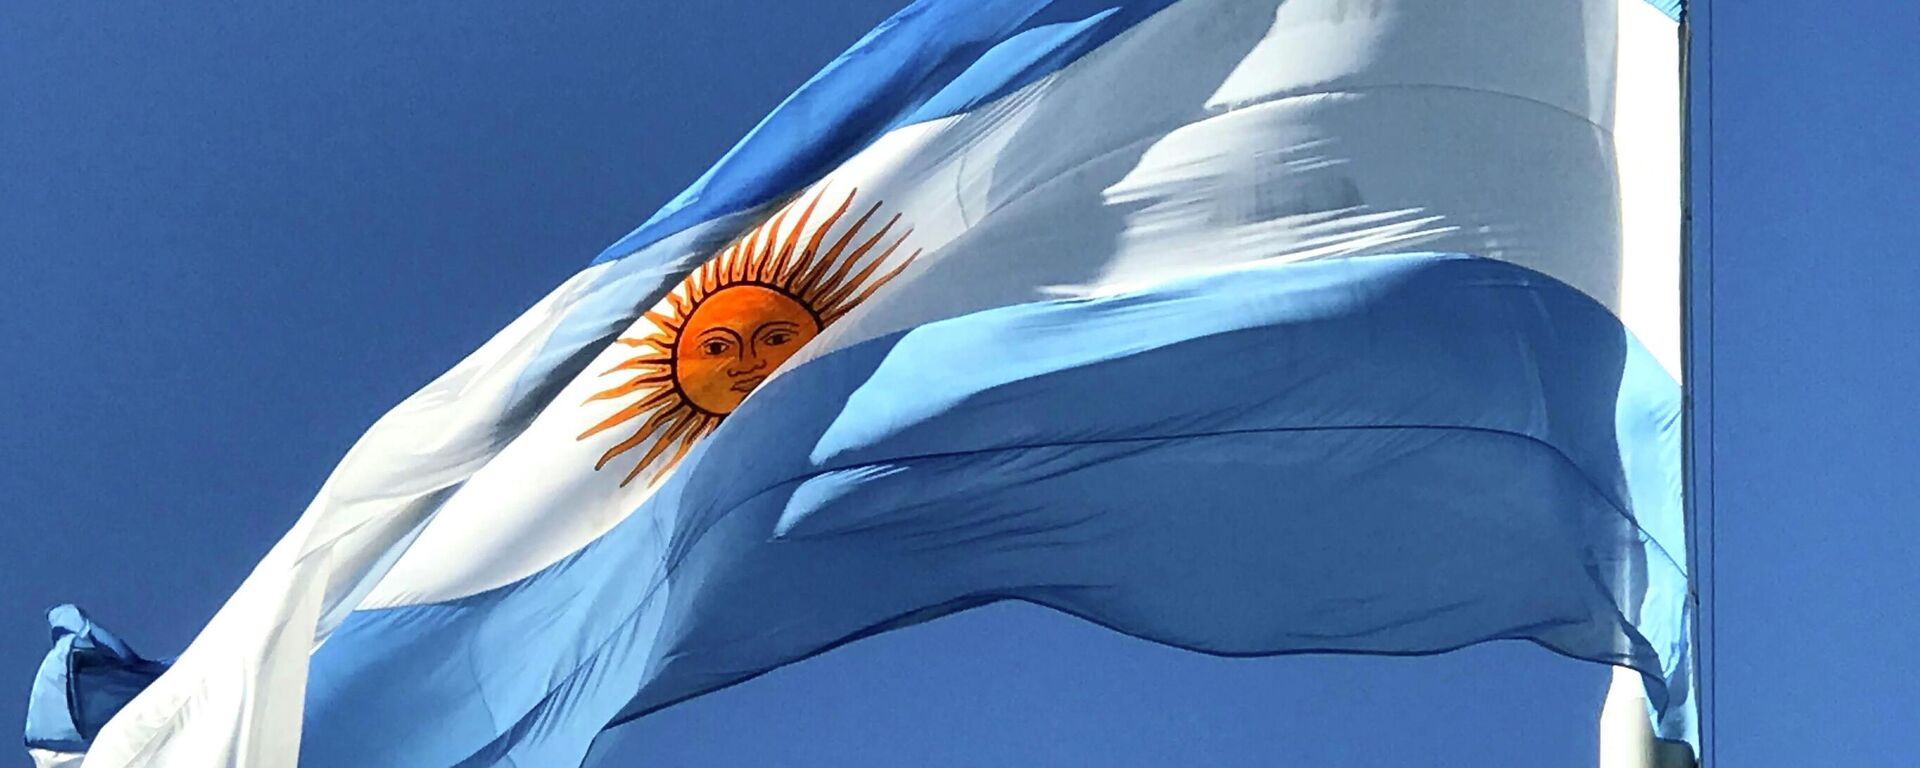 Bandera de Argentina - Sputnik Mundo, 1920, 19.08.2021